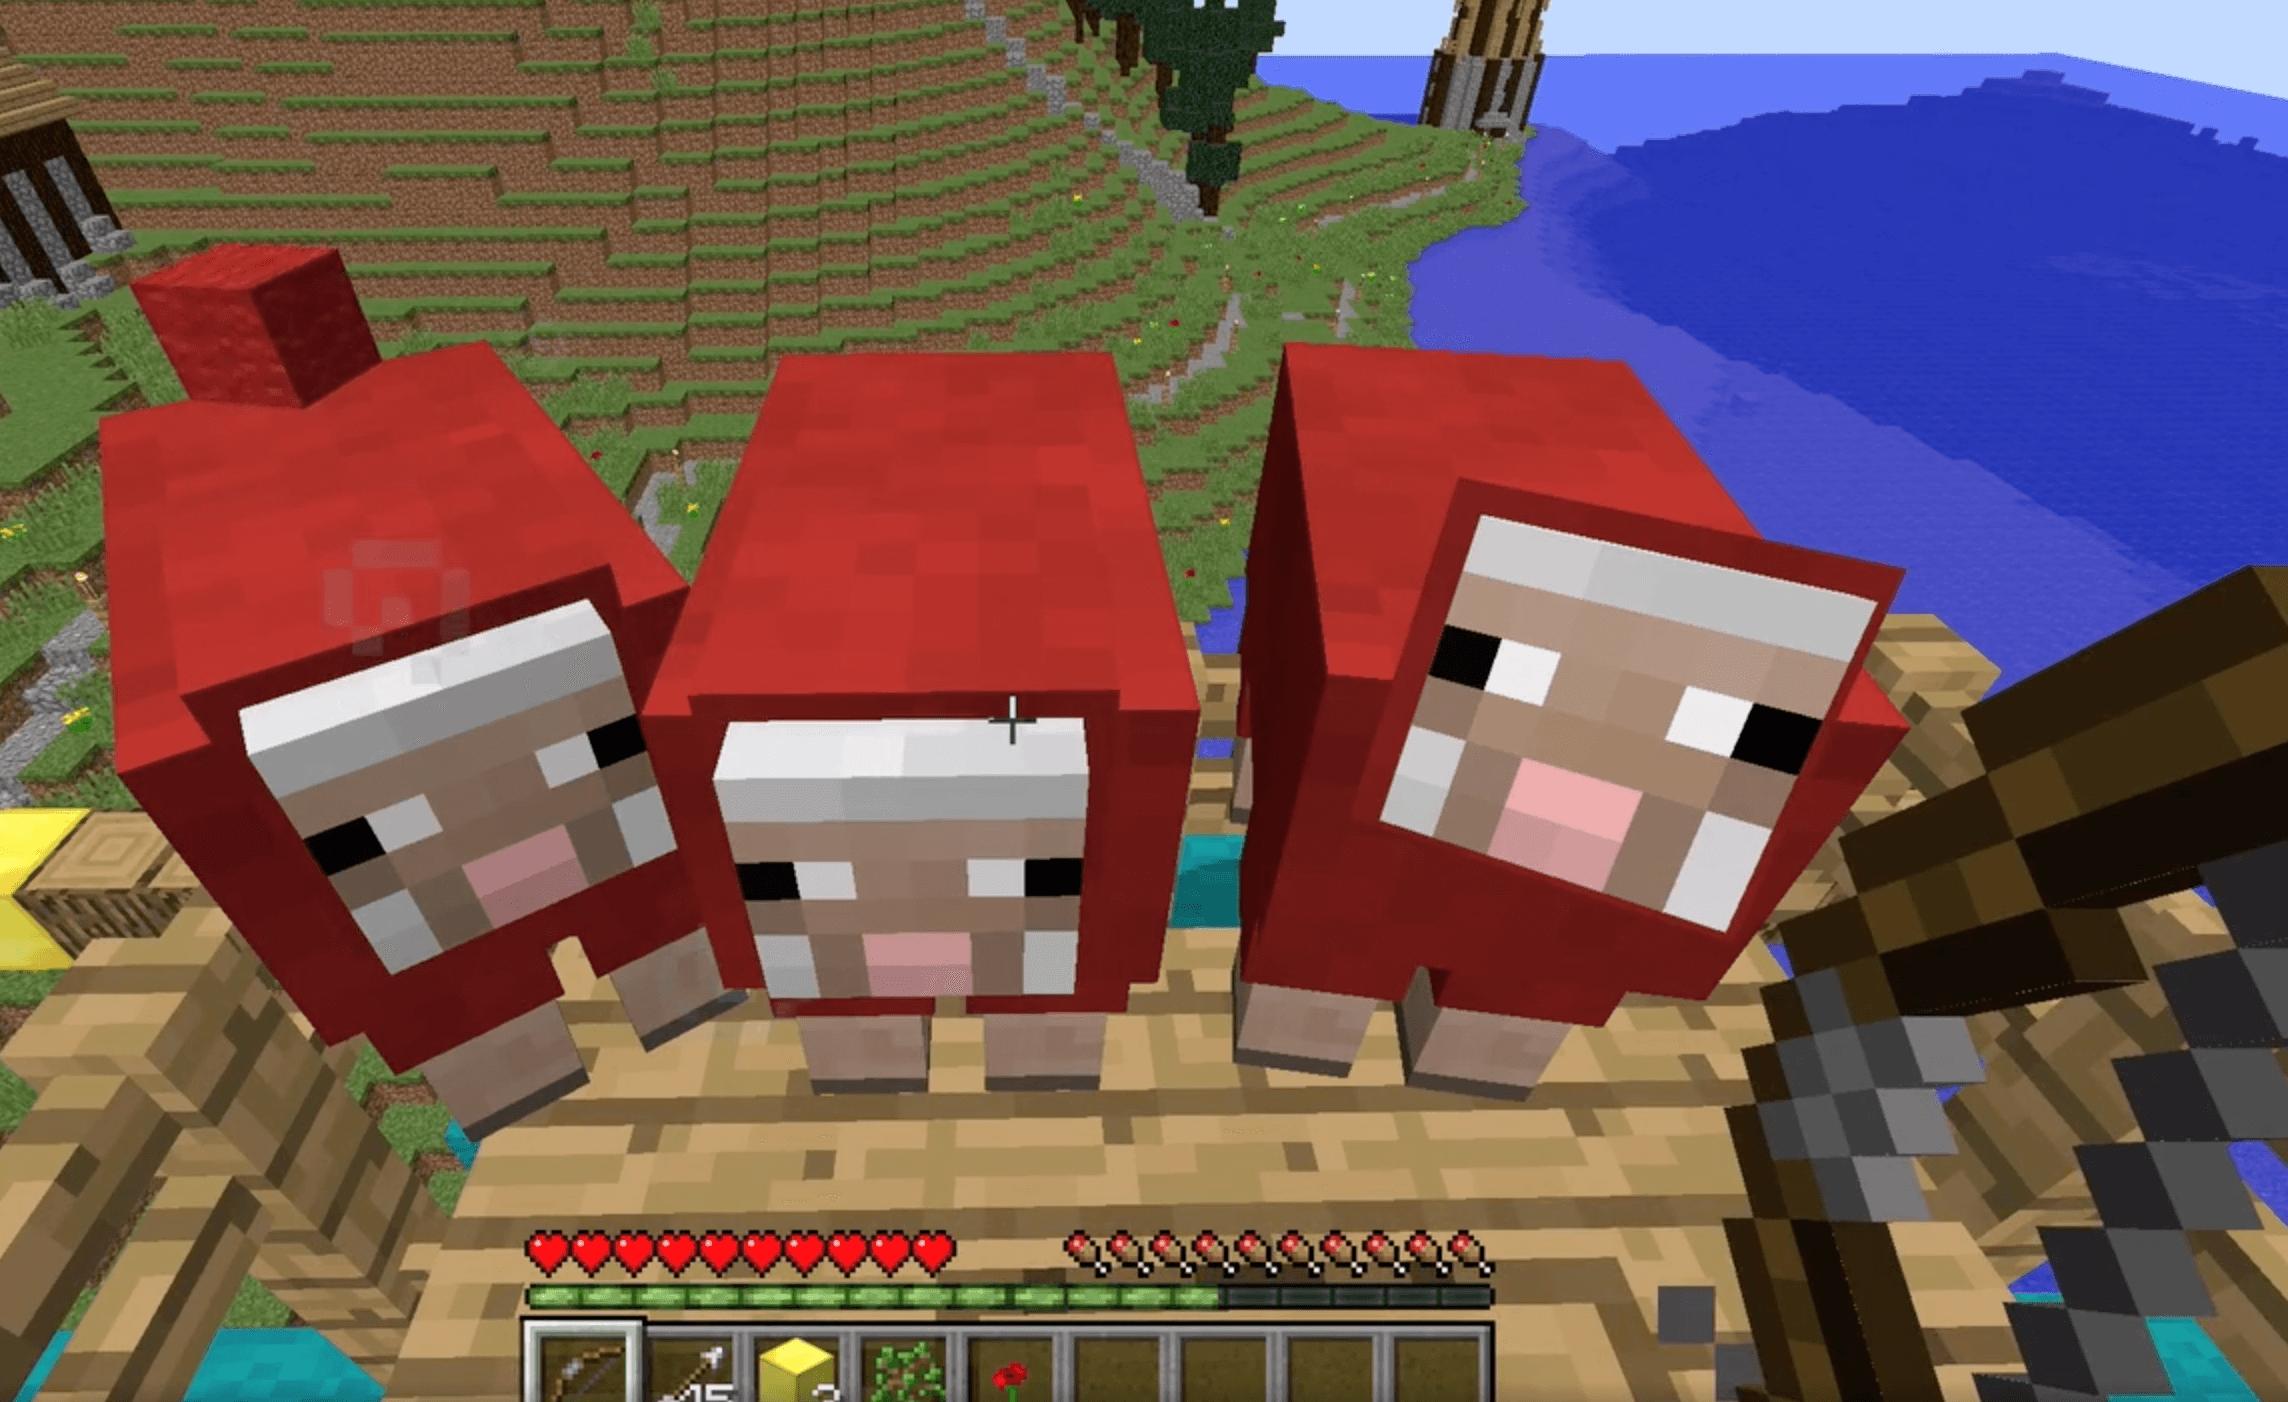 minecraft red sheep, minecraft modding camp, virtual tech camp